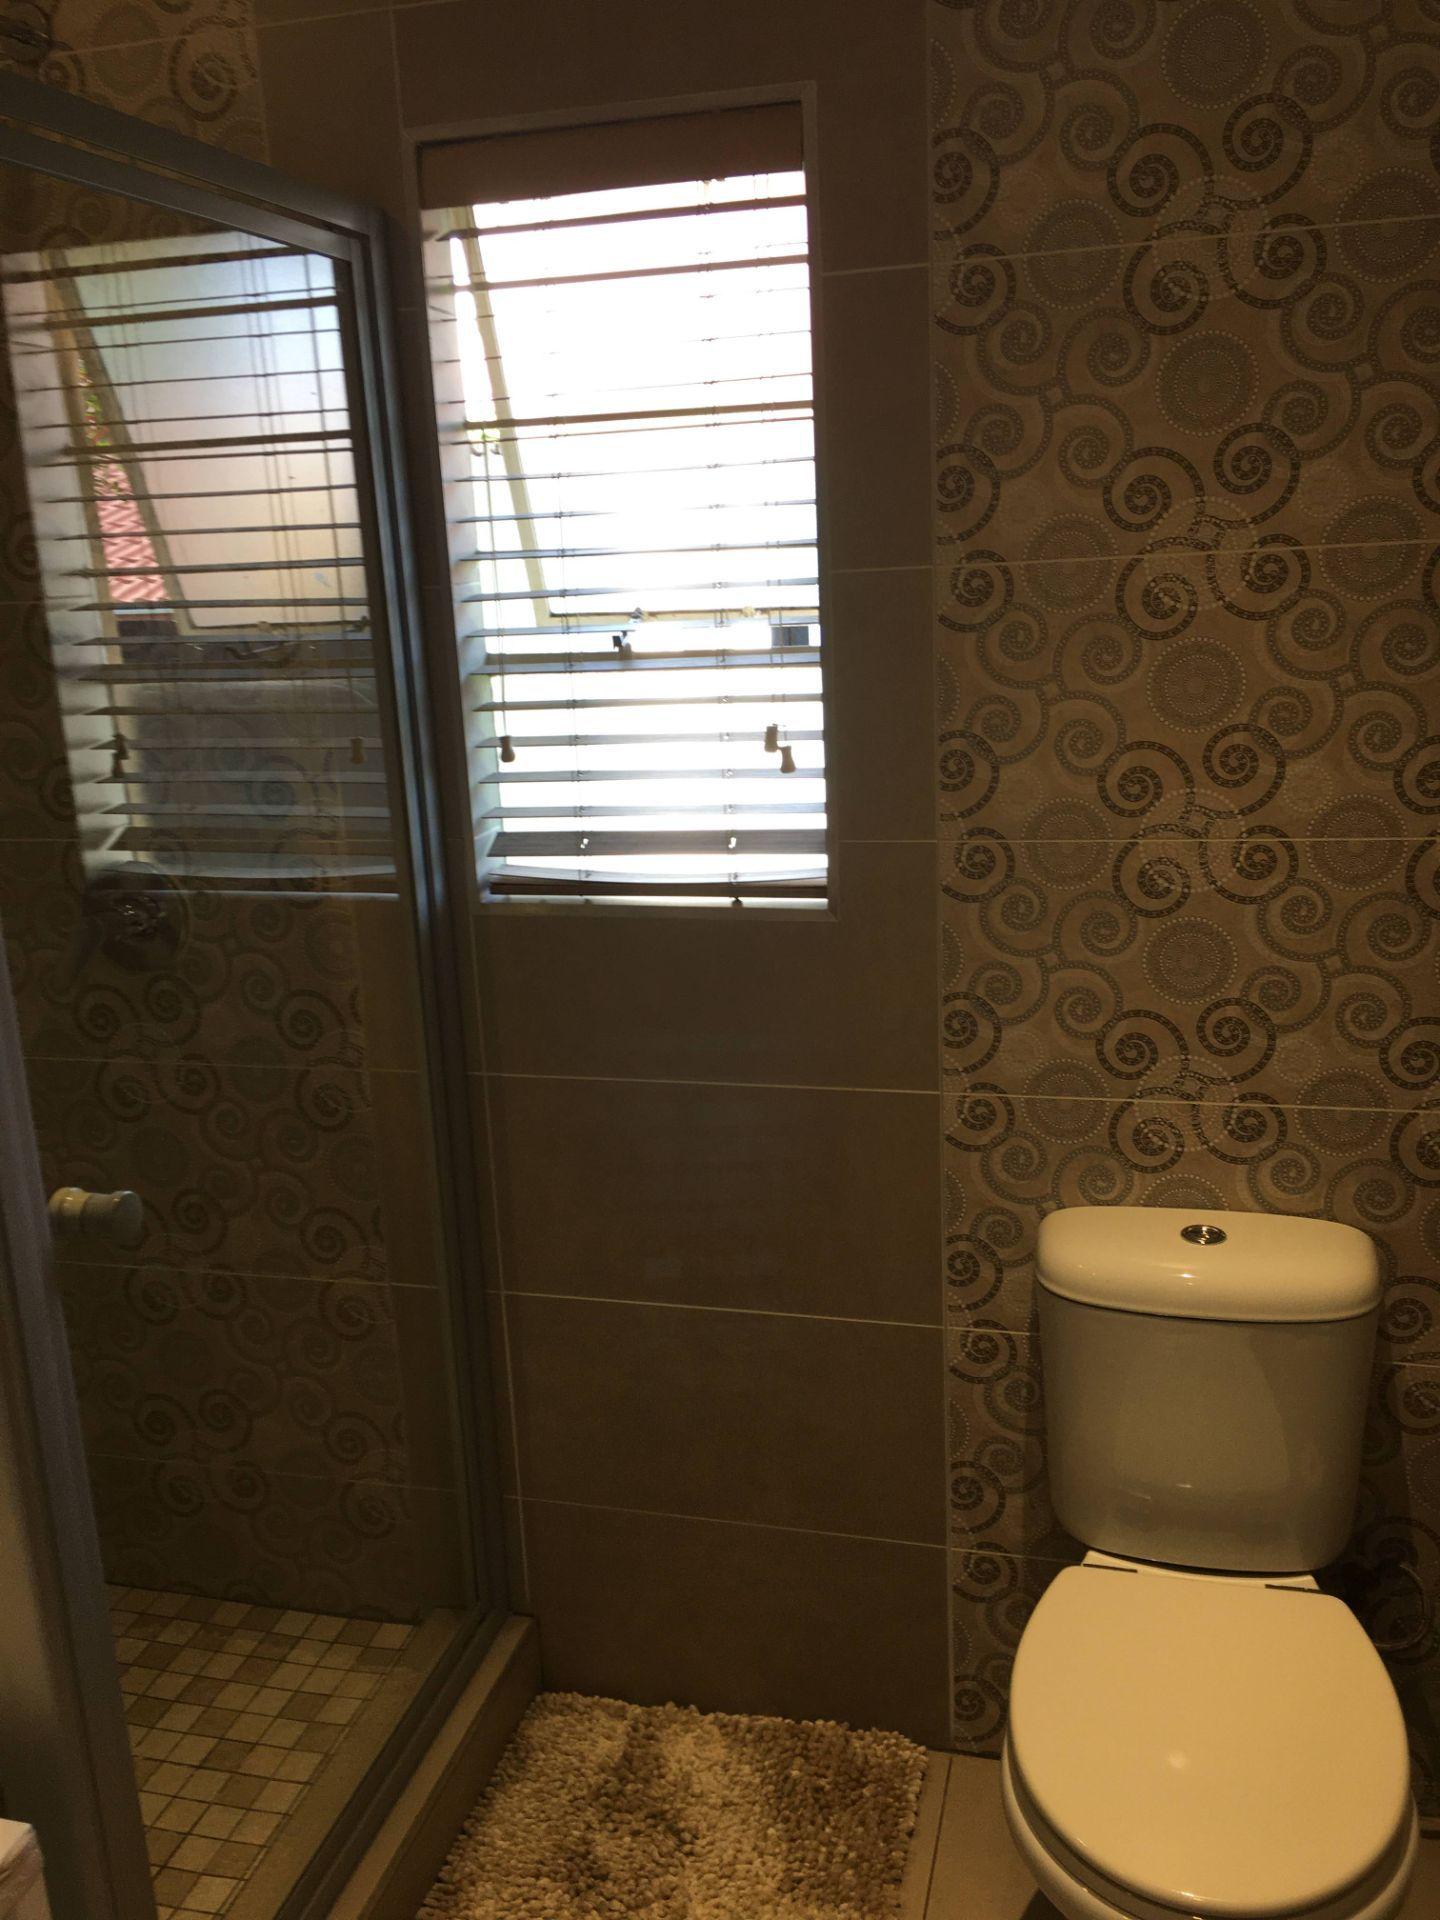 24_VT 23 Bathroom_4.JPG